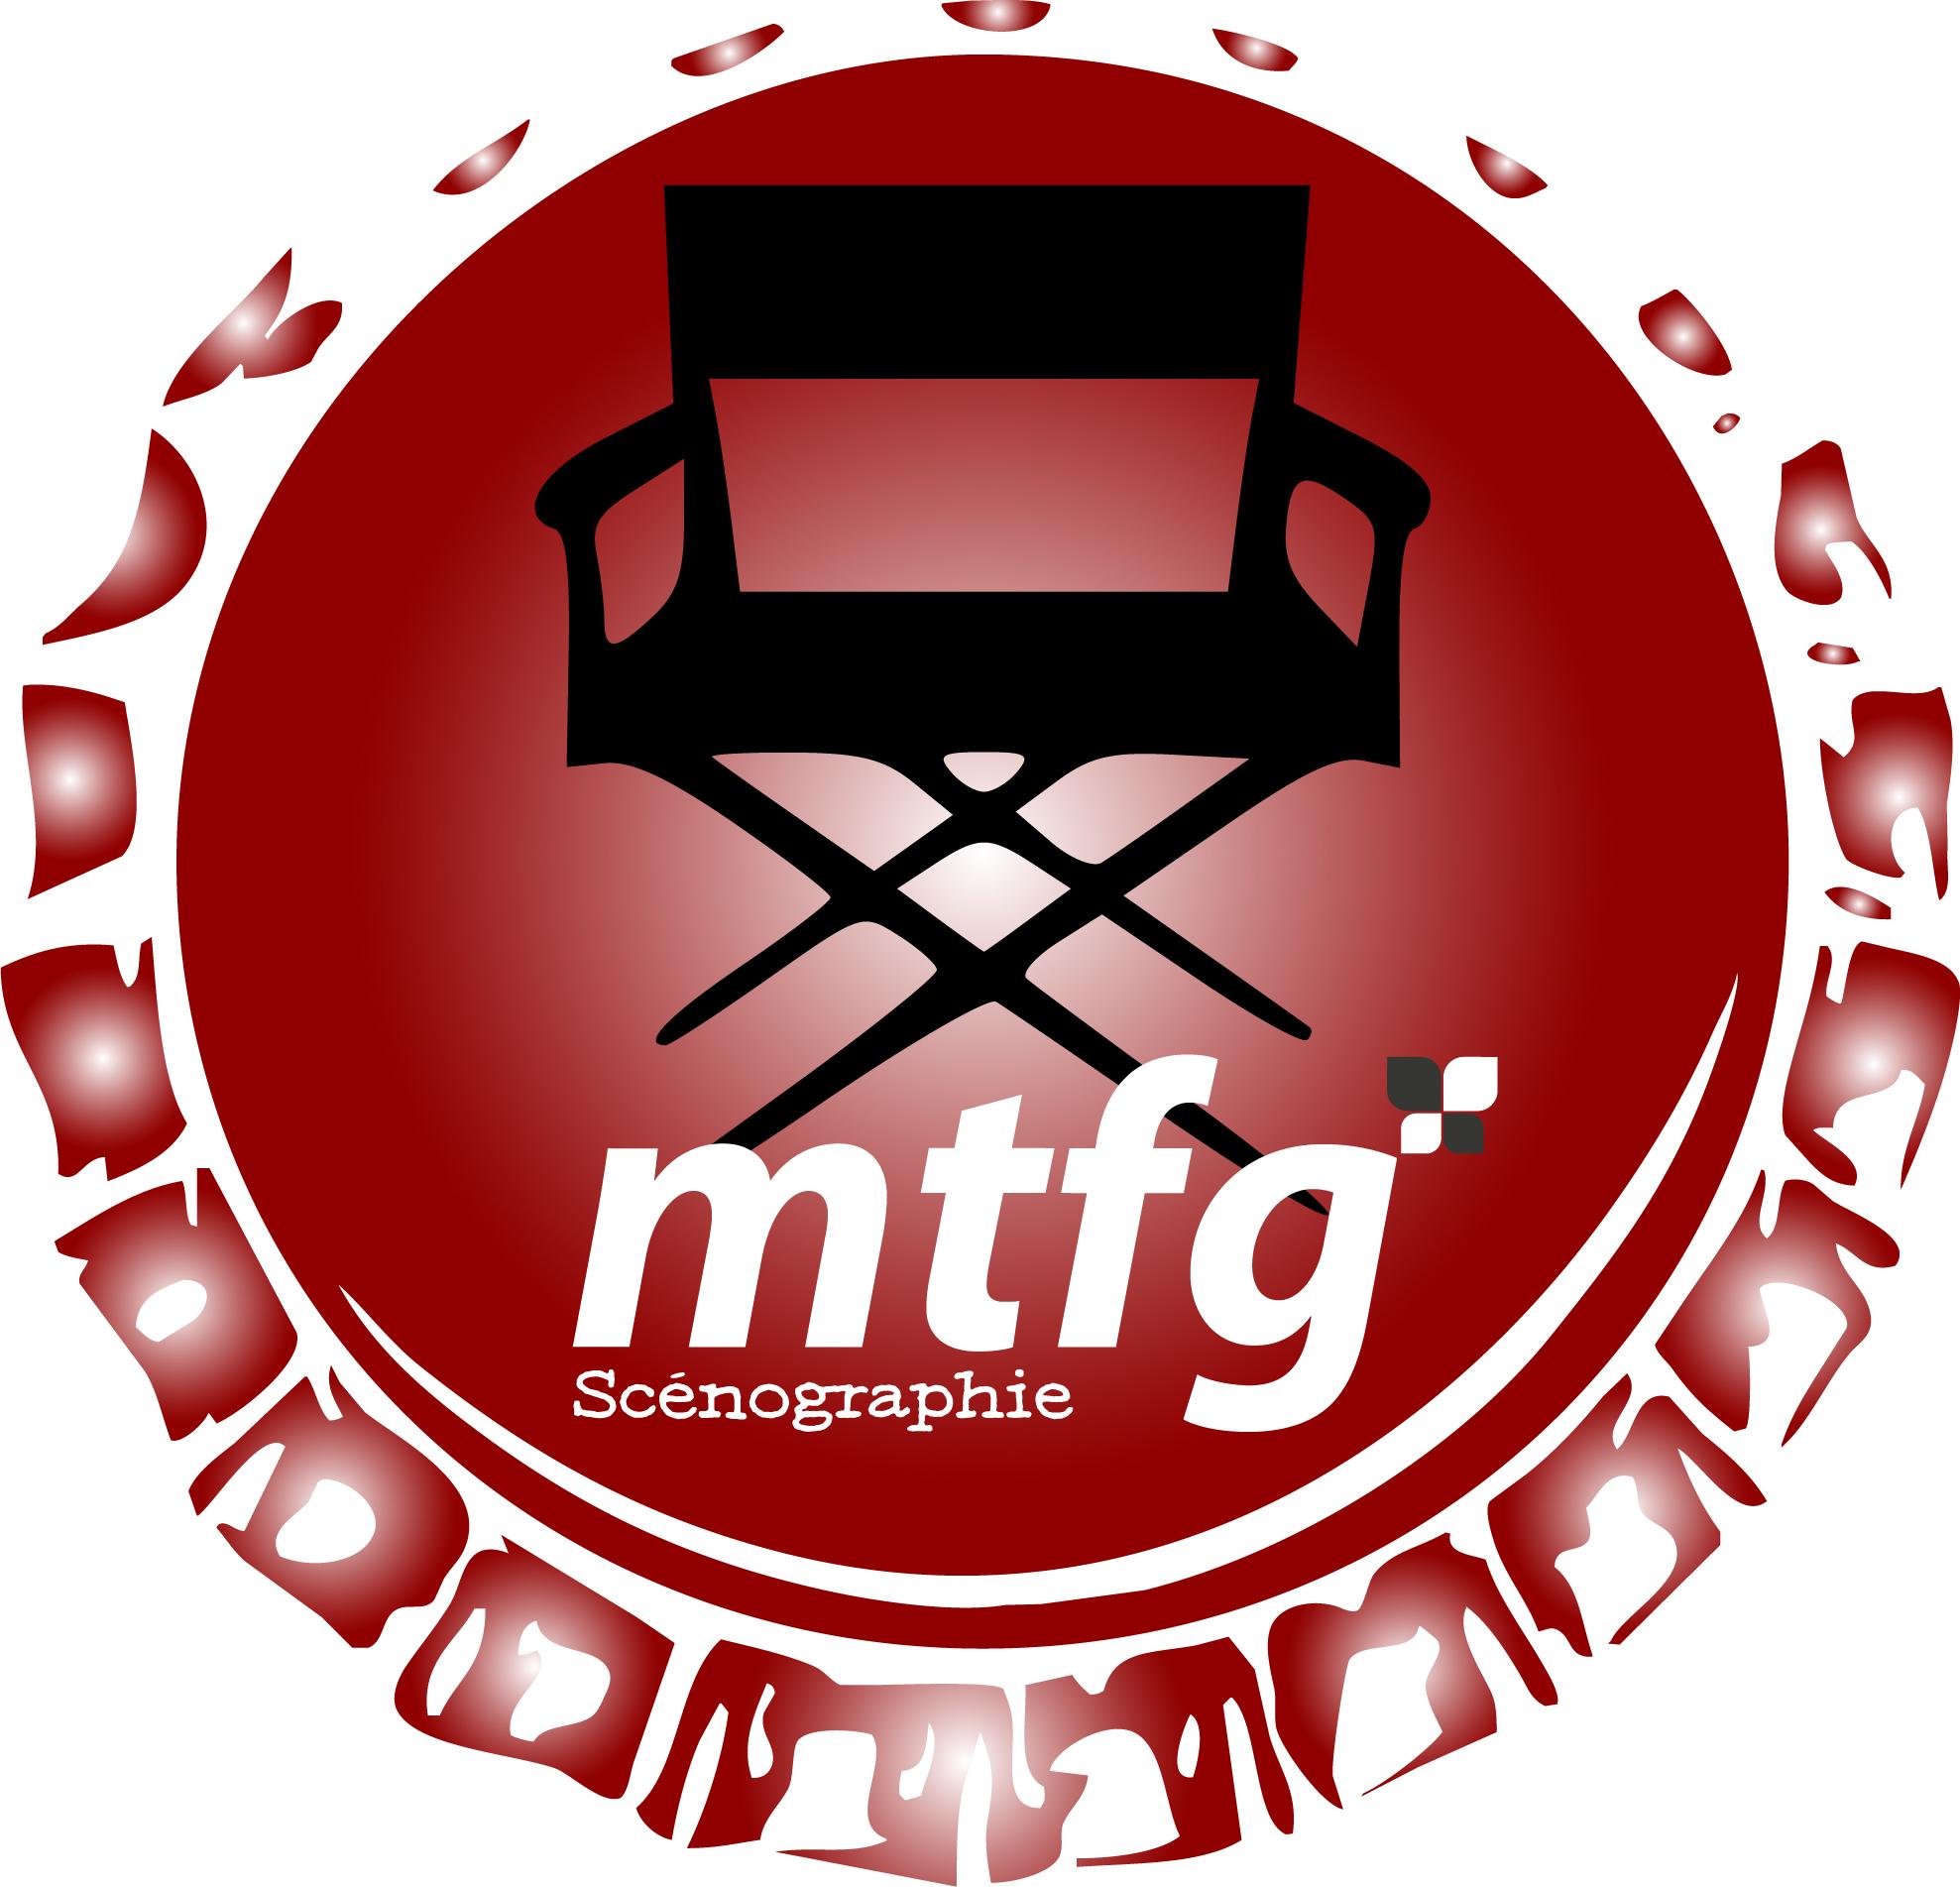 MTFG Scénographie